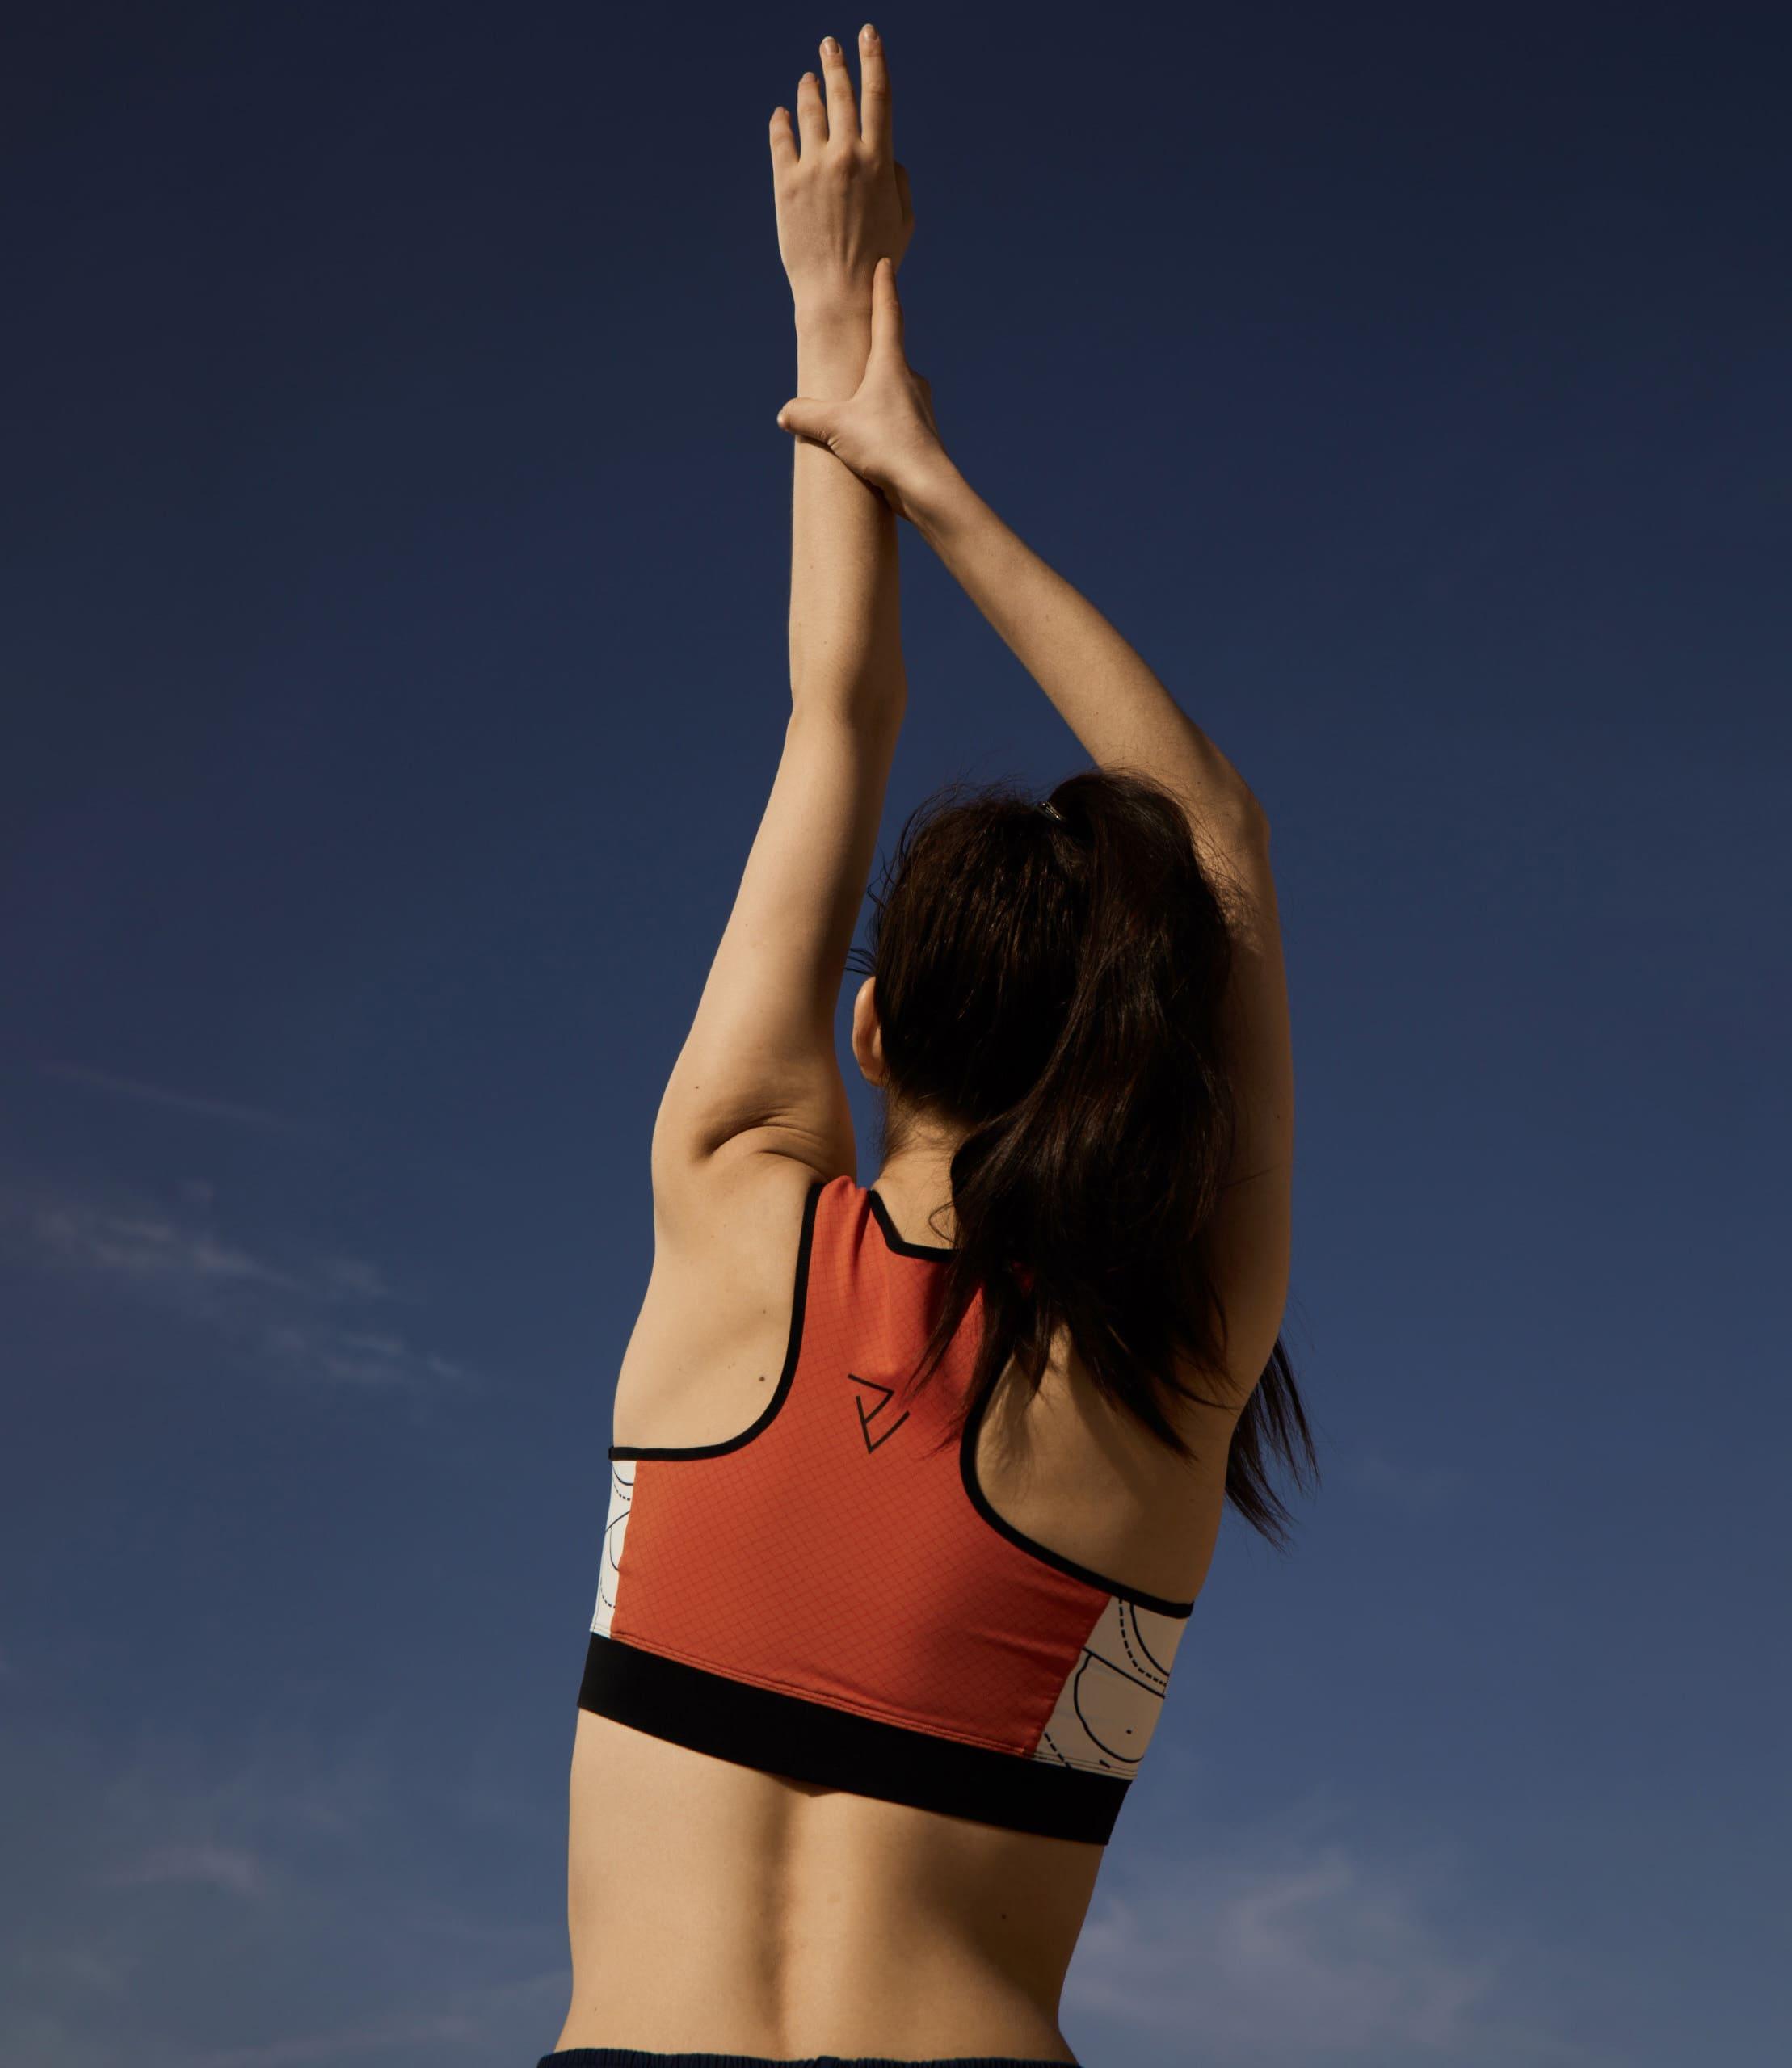 rv-c1-women-hands-air-sportsbra